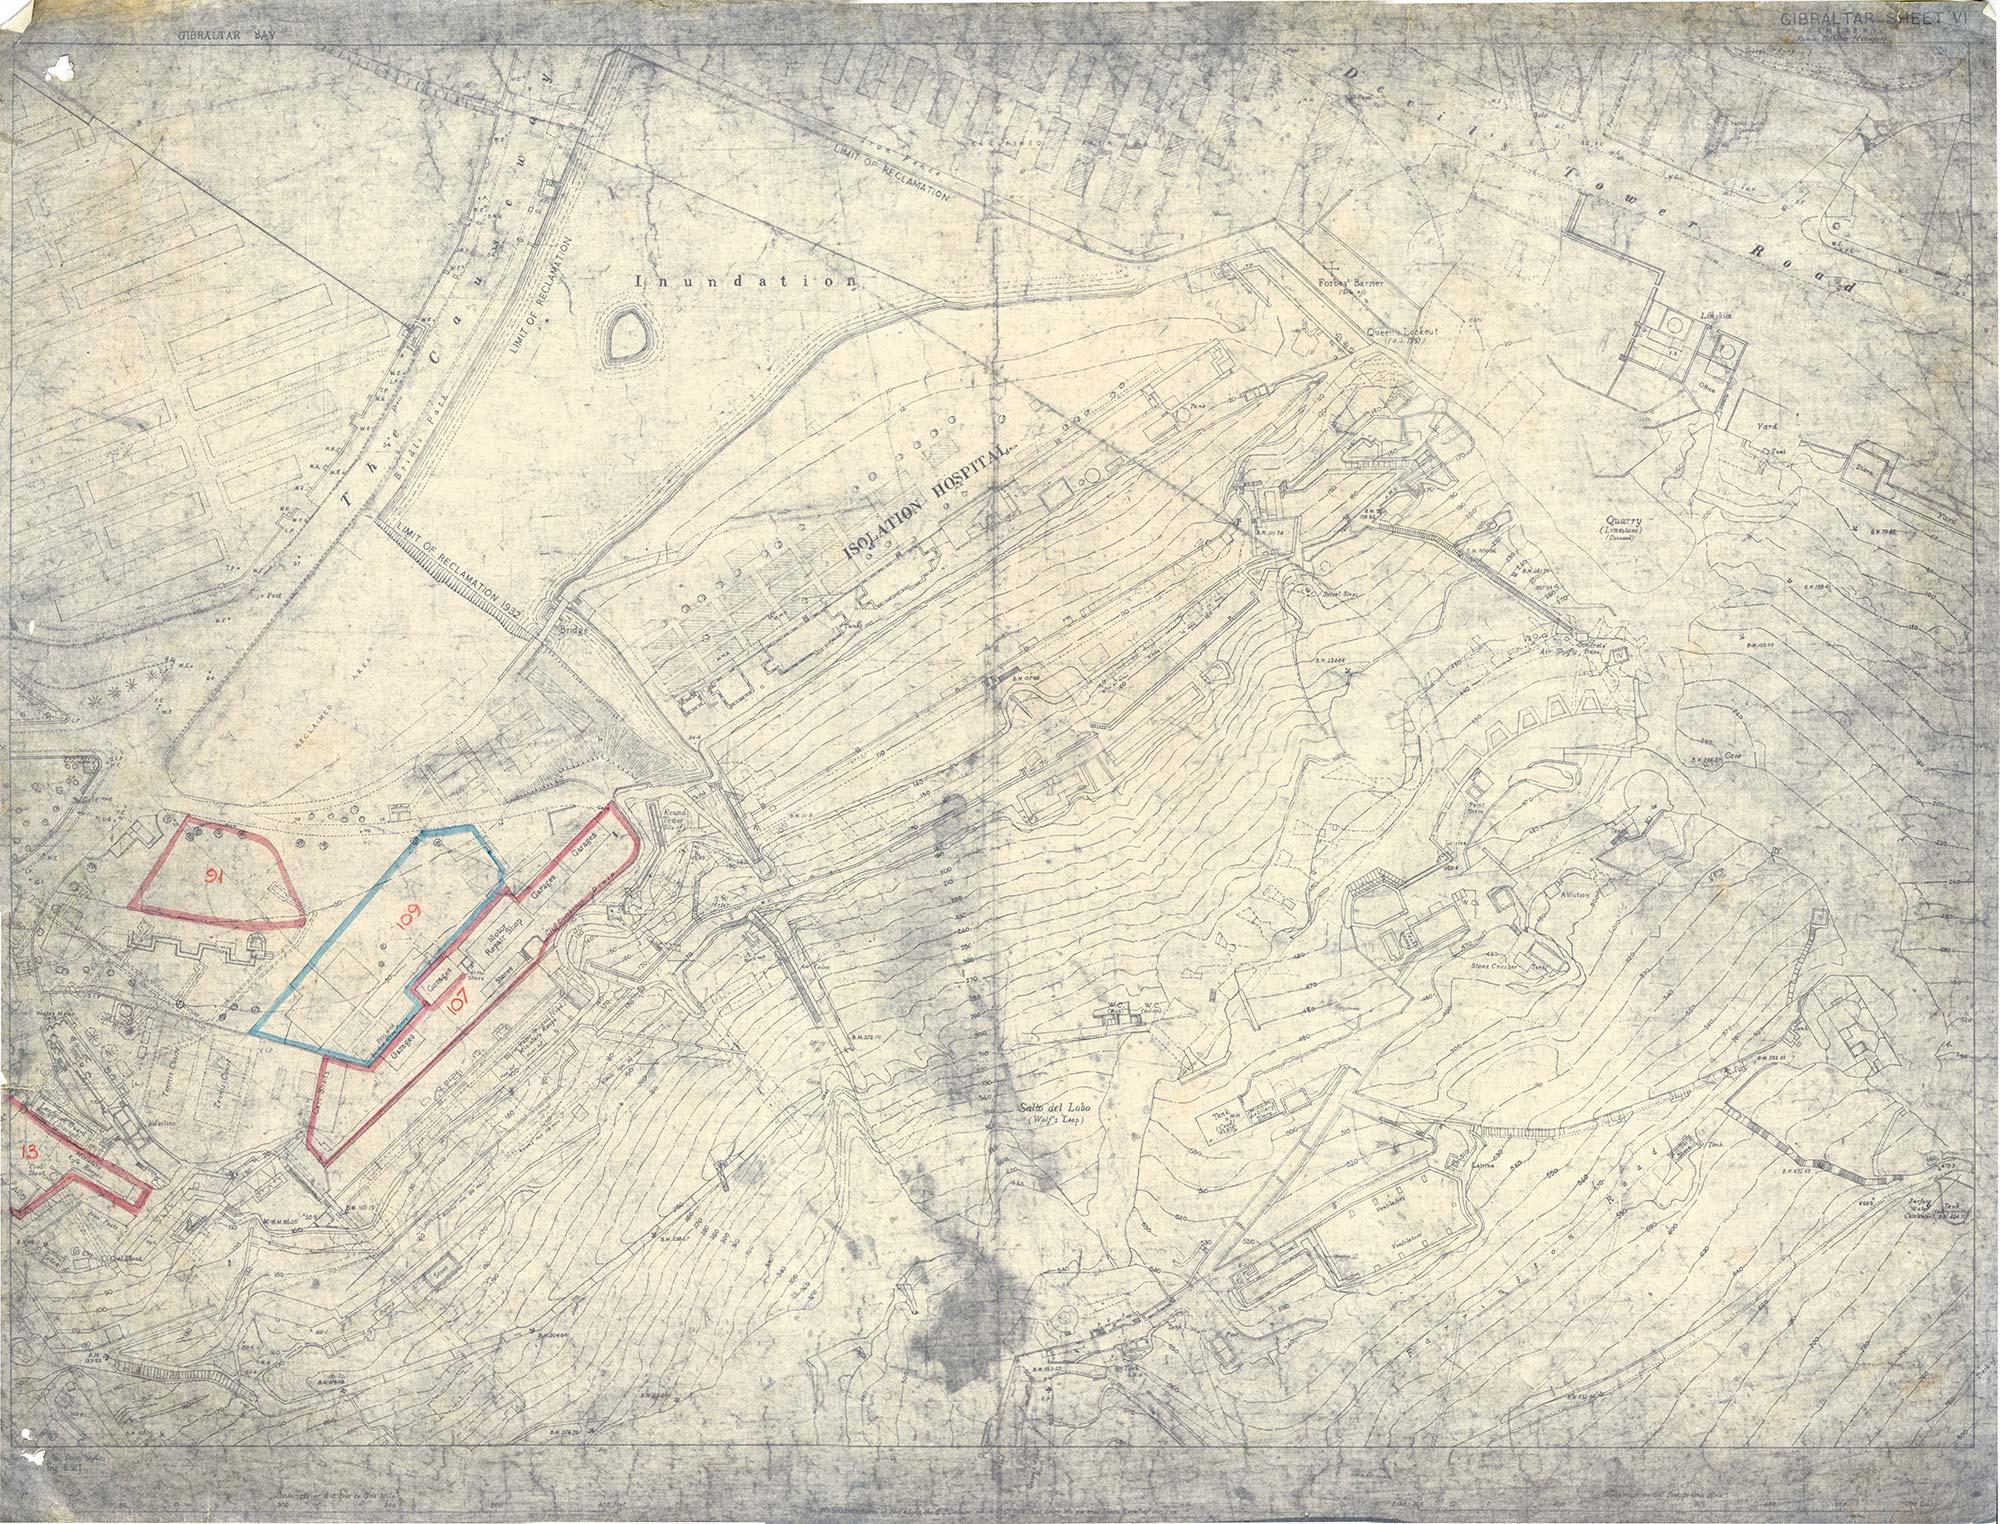 Map-9-Sheet-6-Laguna-Estate-and-DTC-Road-1940